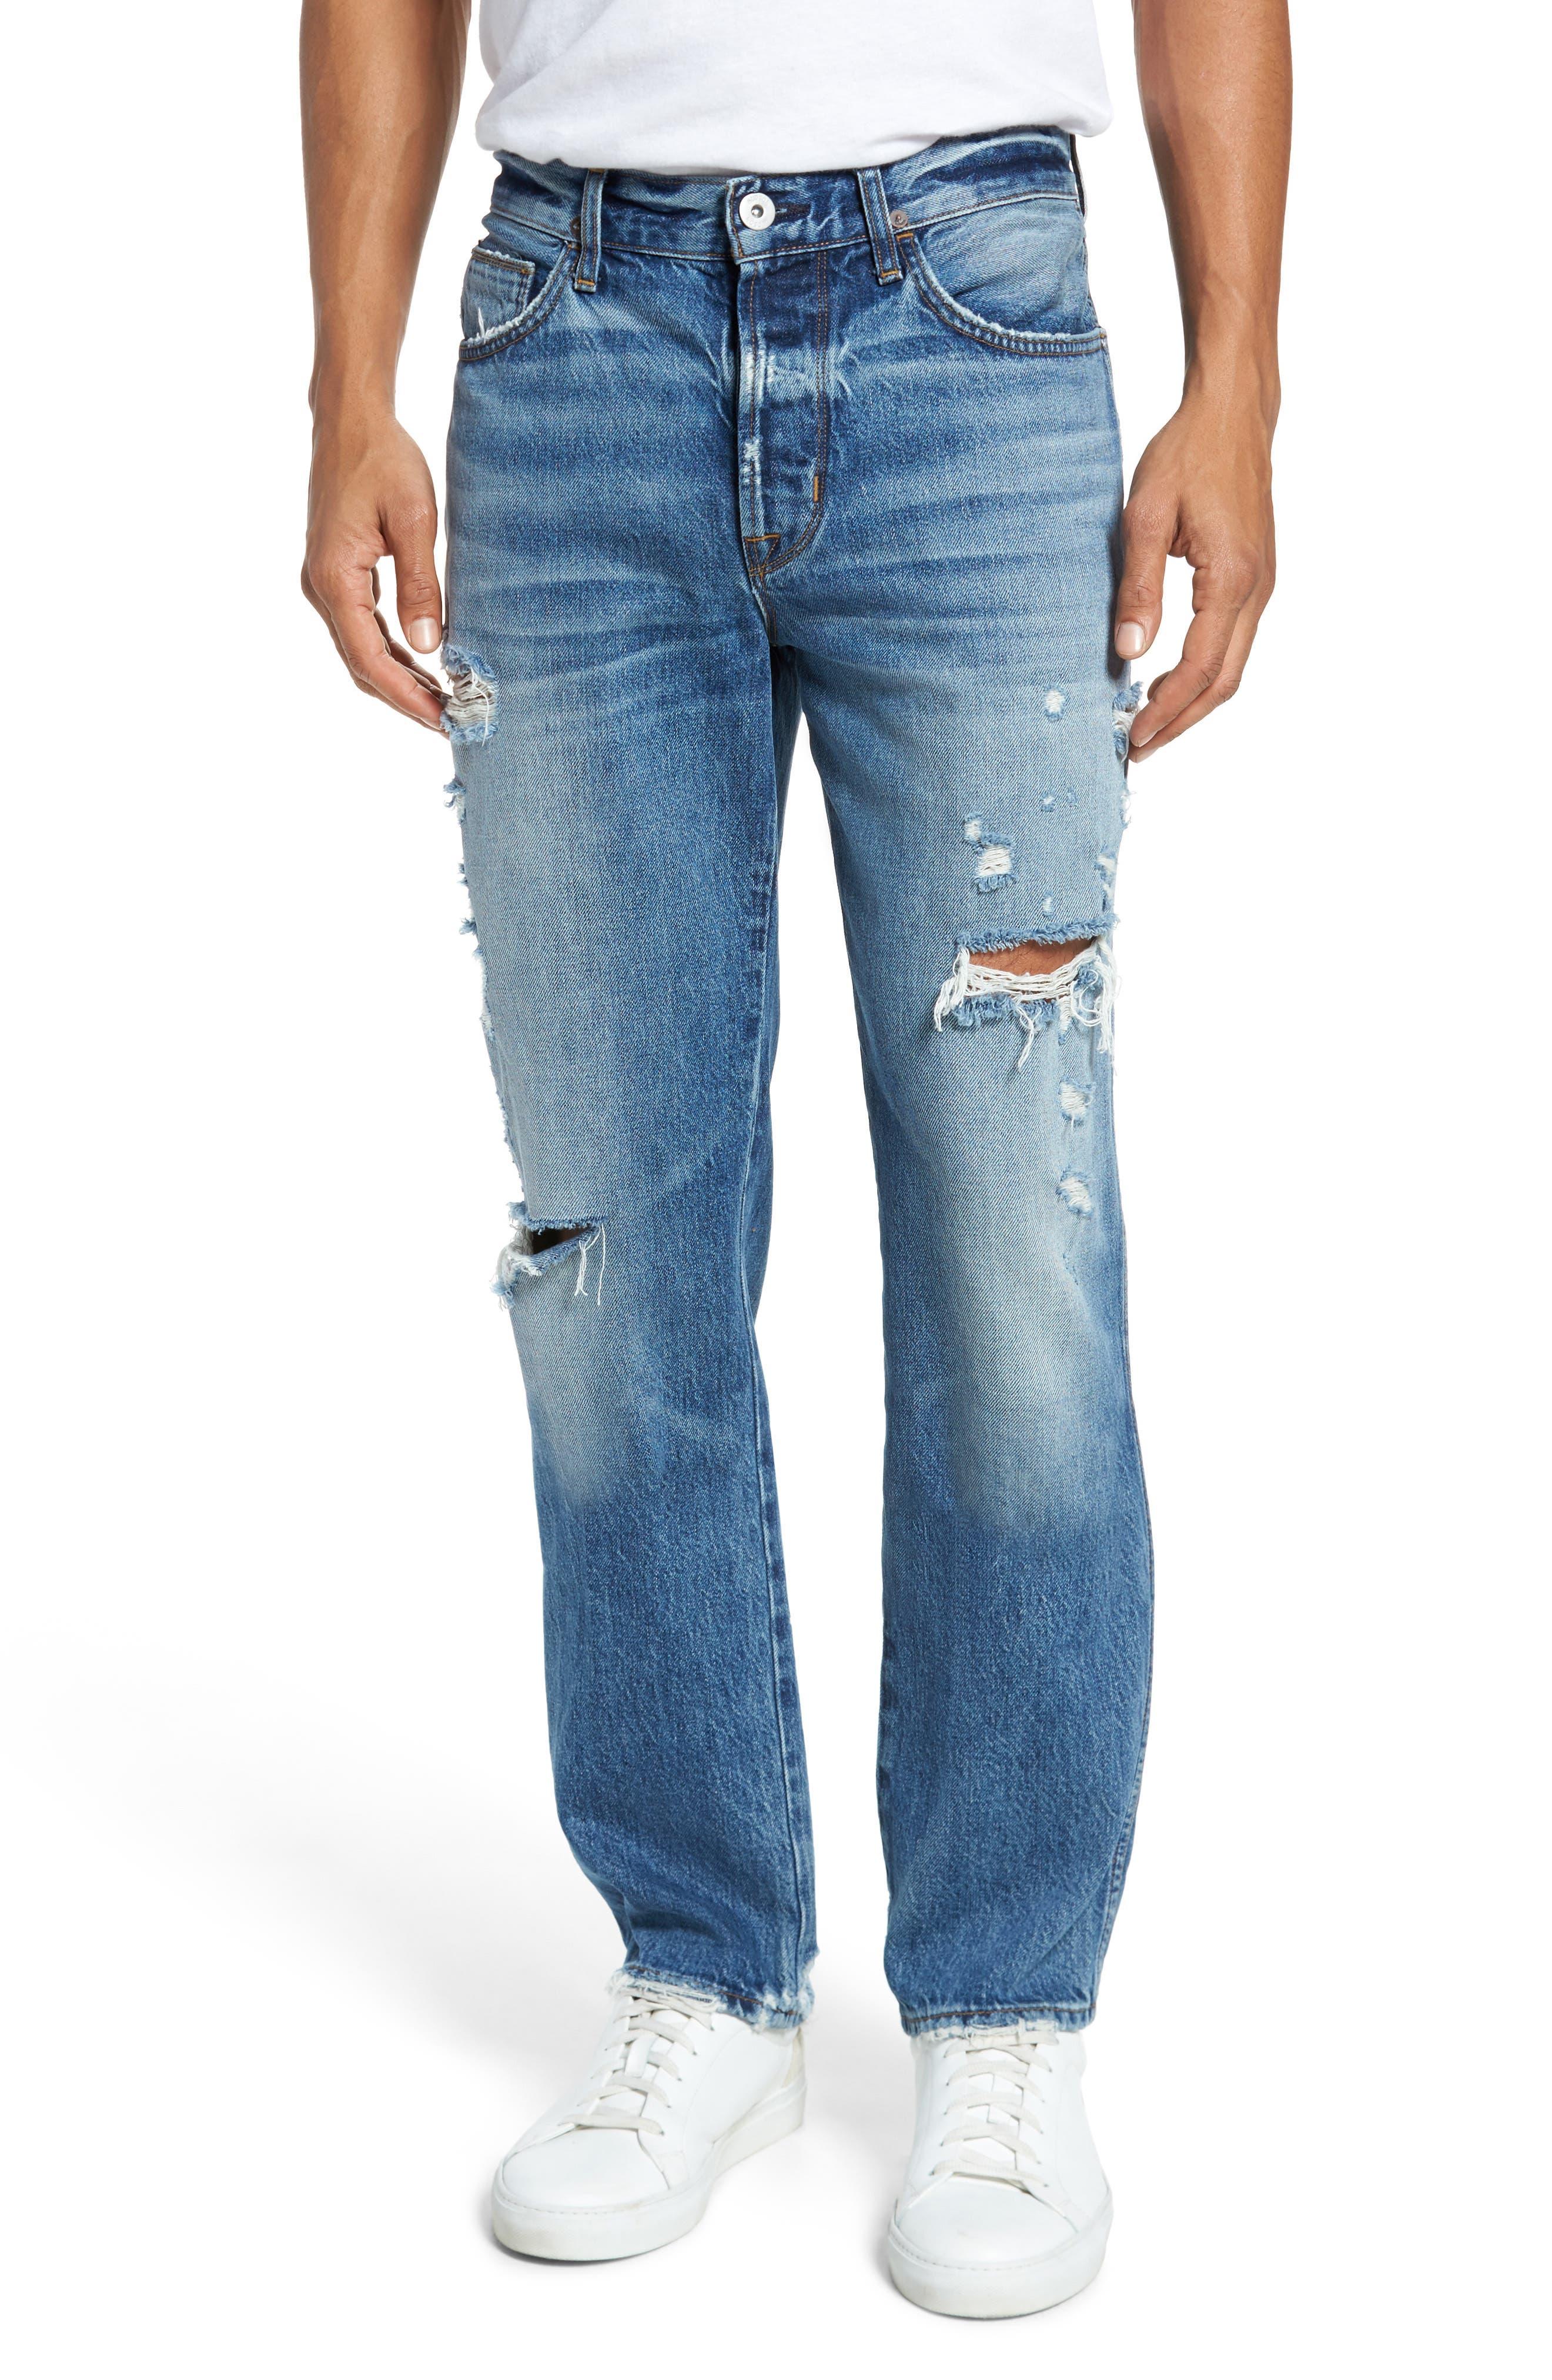 Dixon Straight Fit Jeans,                         Main,                         color, Landmark